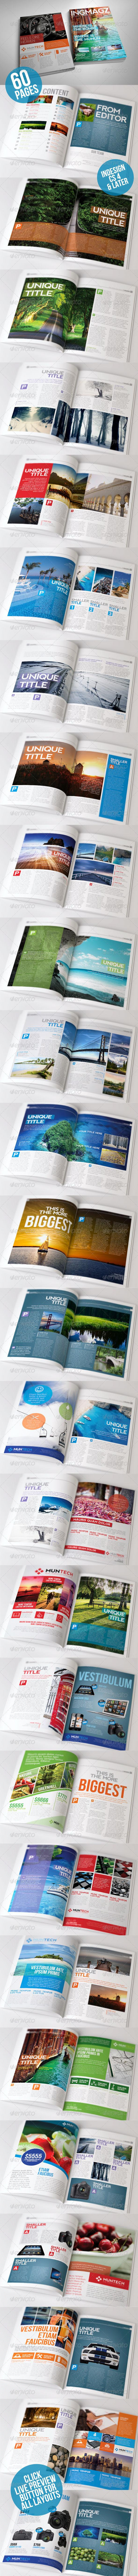 60 Page INGMAGZ Magazine Template - Magazines Print Templates